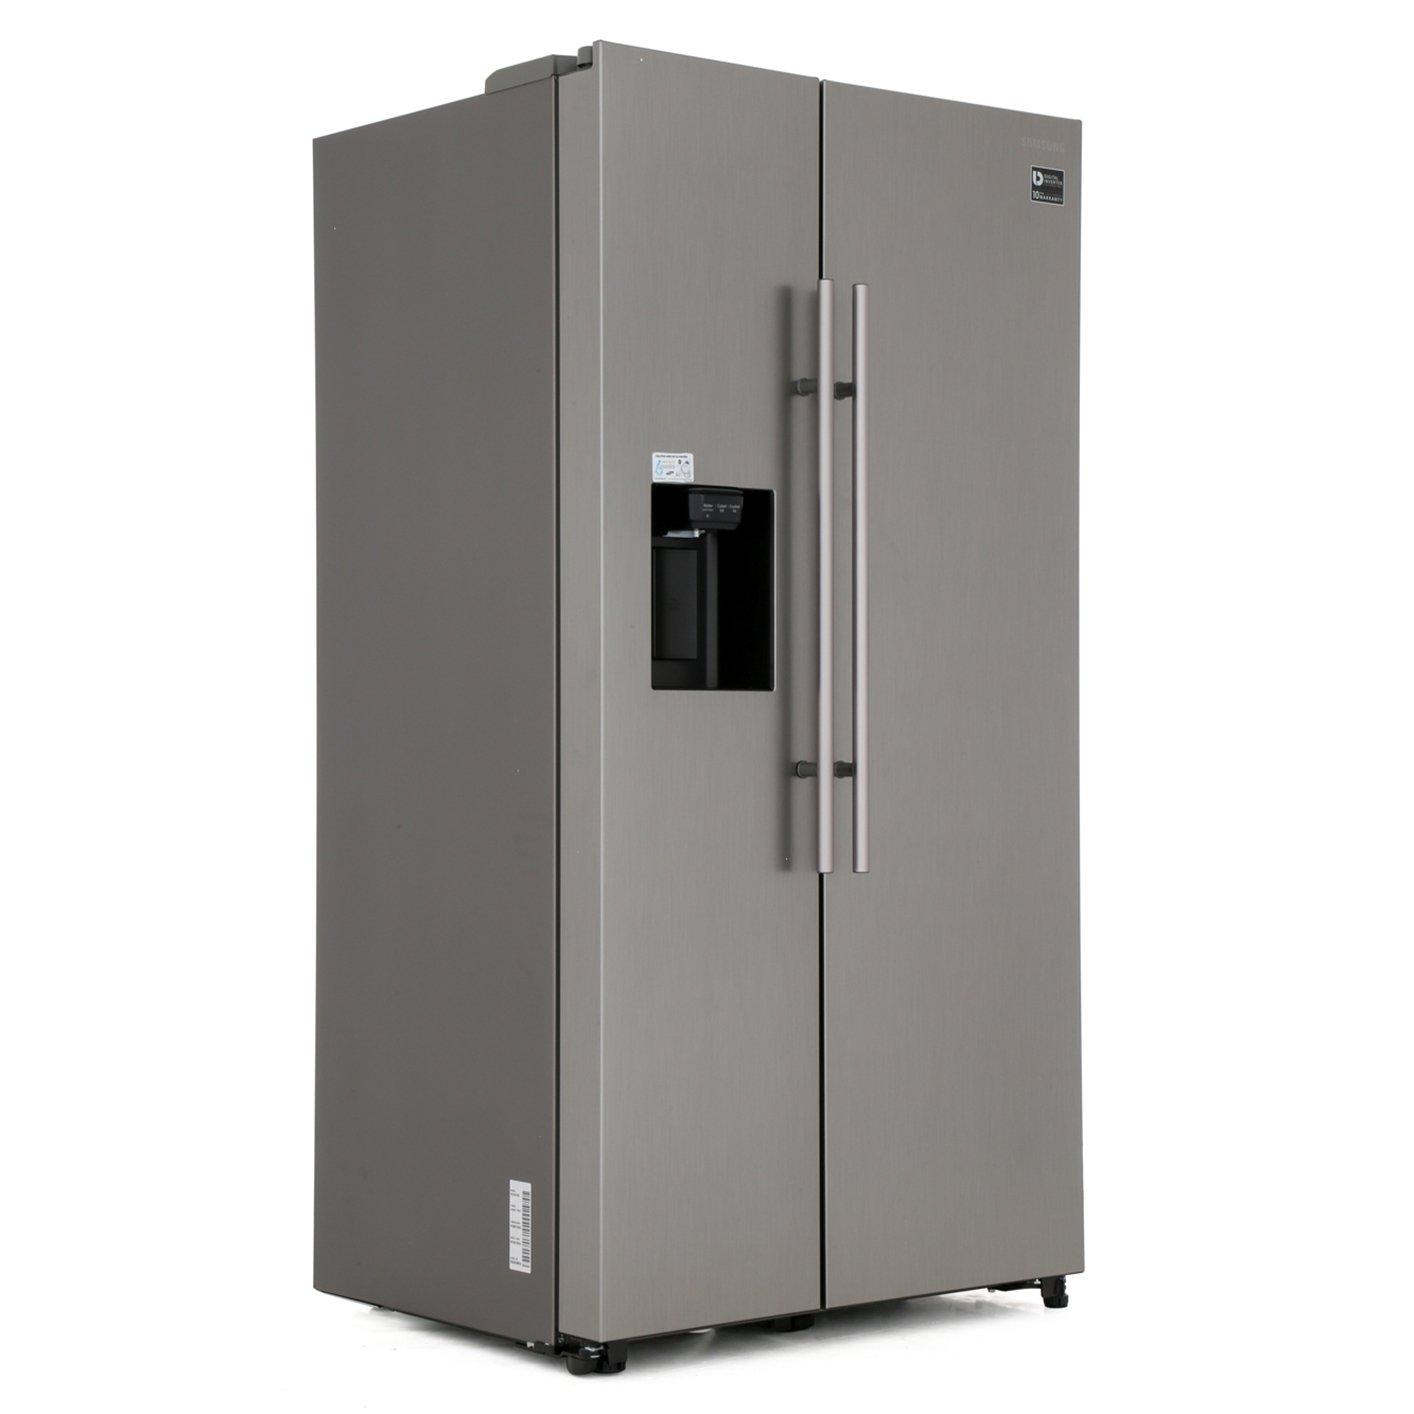 Samsung RS67N8210S9 American Style Fridge Freezer